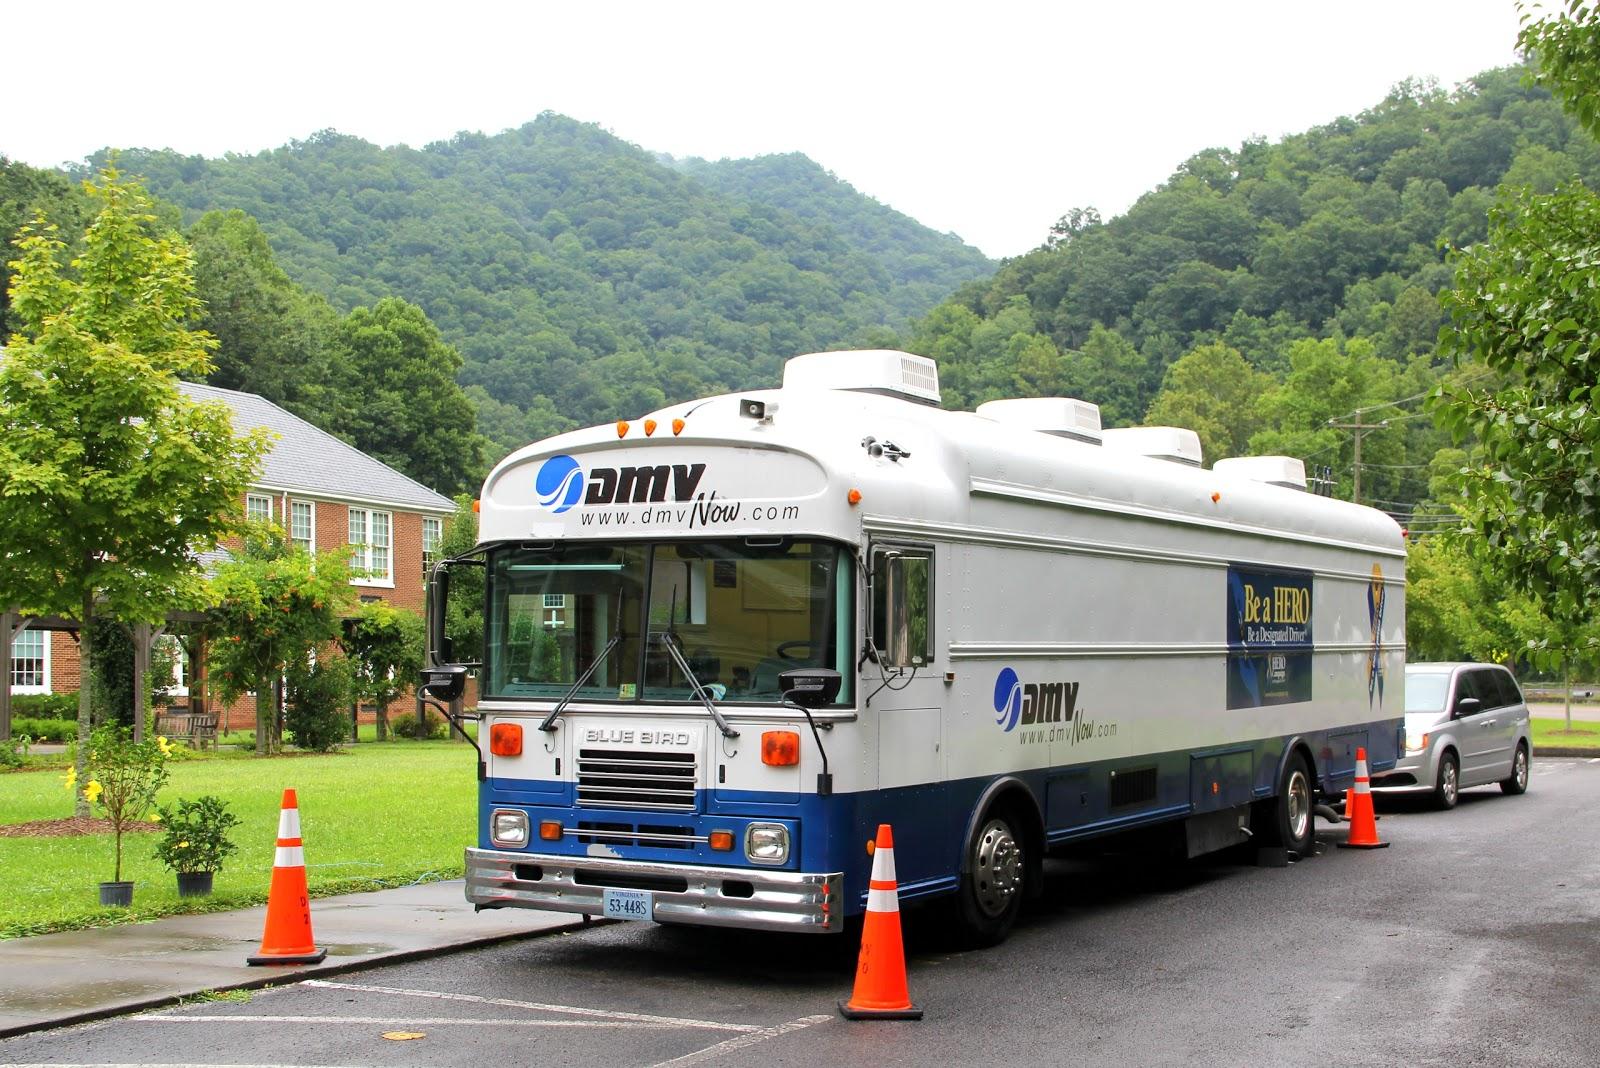 Appalachian school of law blog virginia dmv 2 go to for Department of motor vehicles richmond va